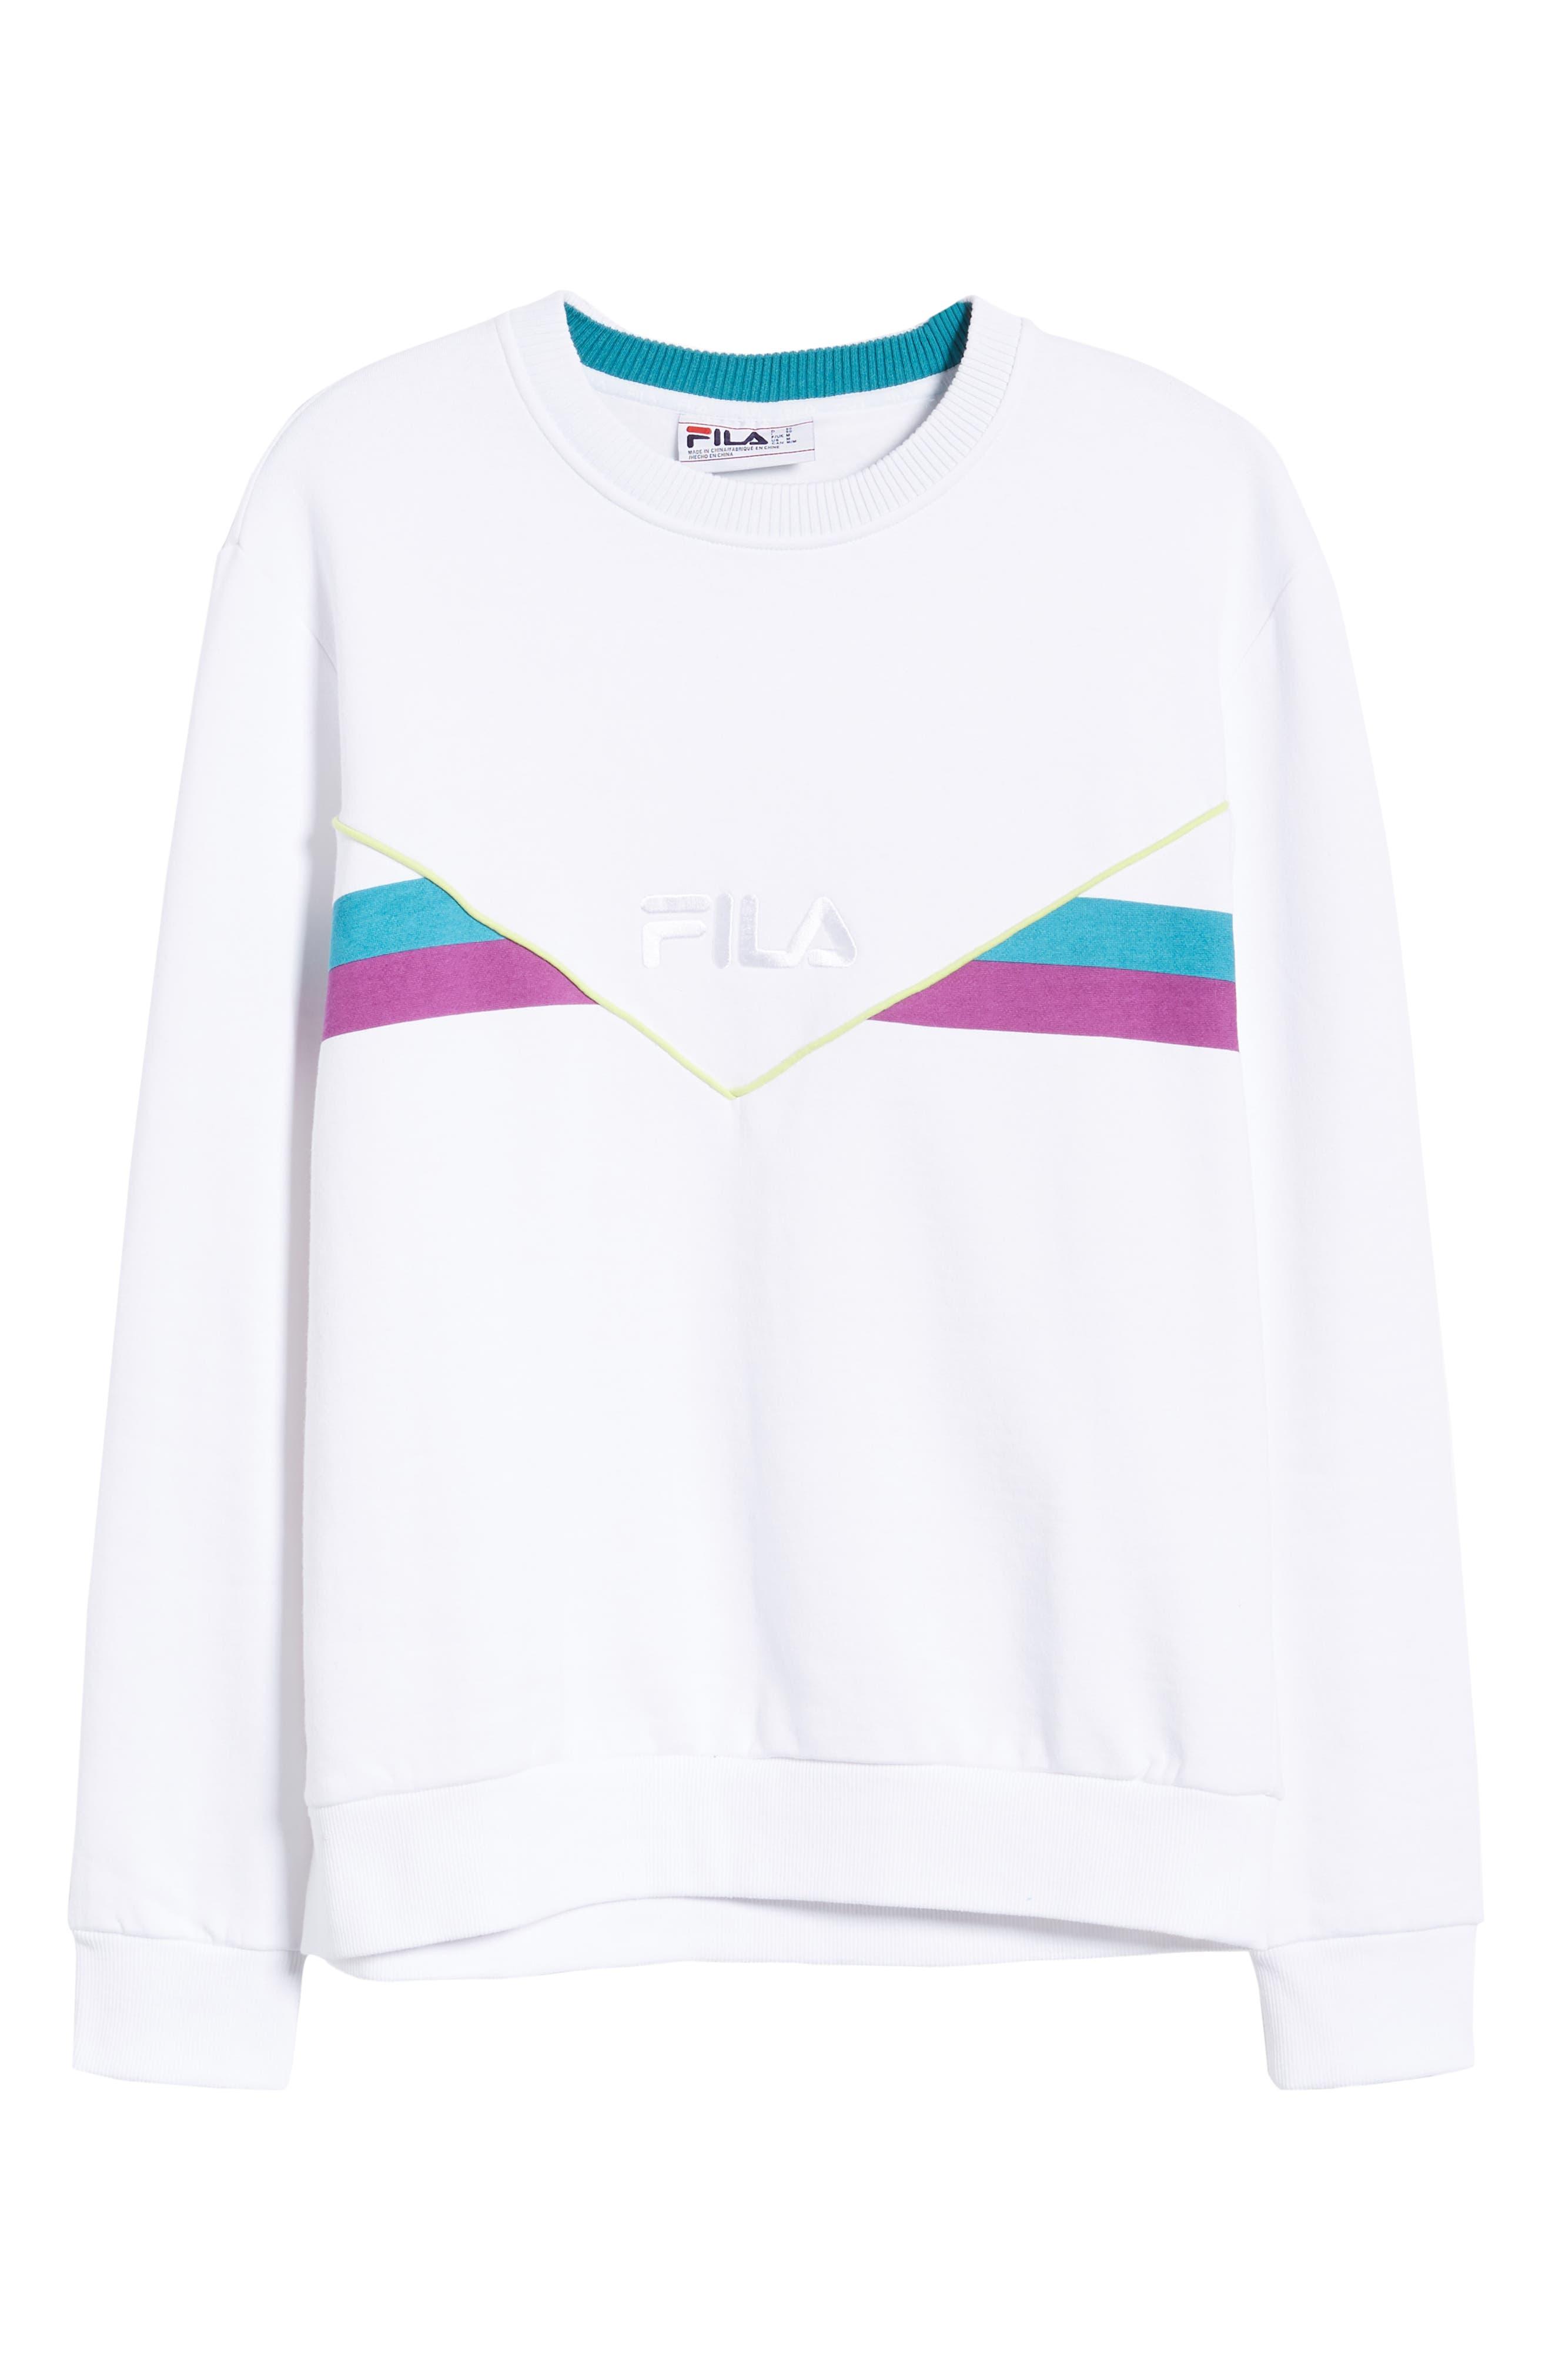 FILA, Leroy Chevron Sweatshirt, Alternate thumbnail 6, color, WHITE